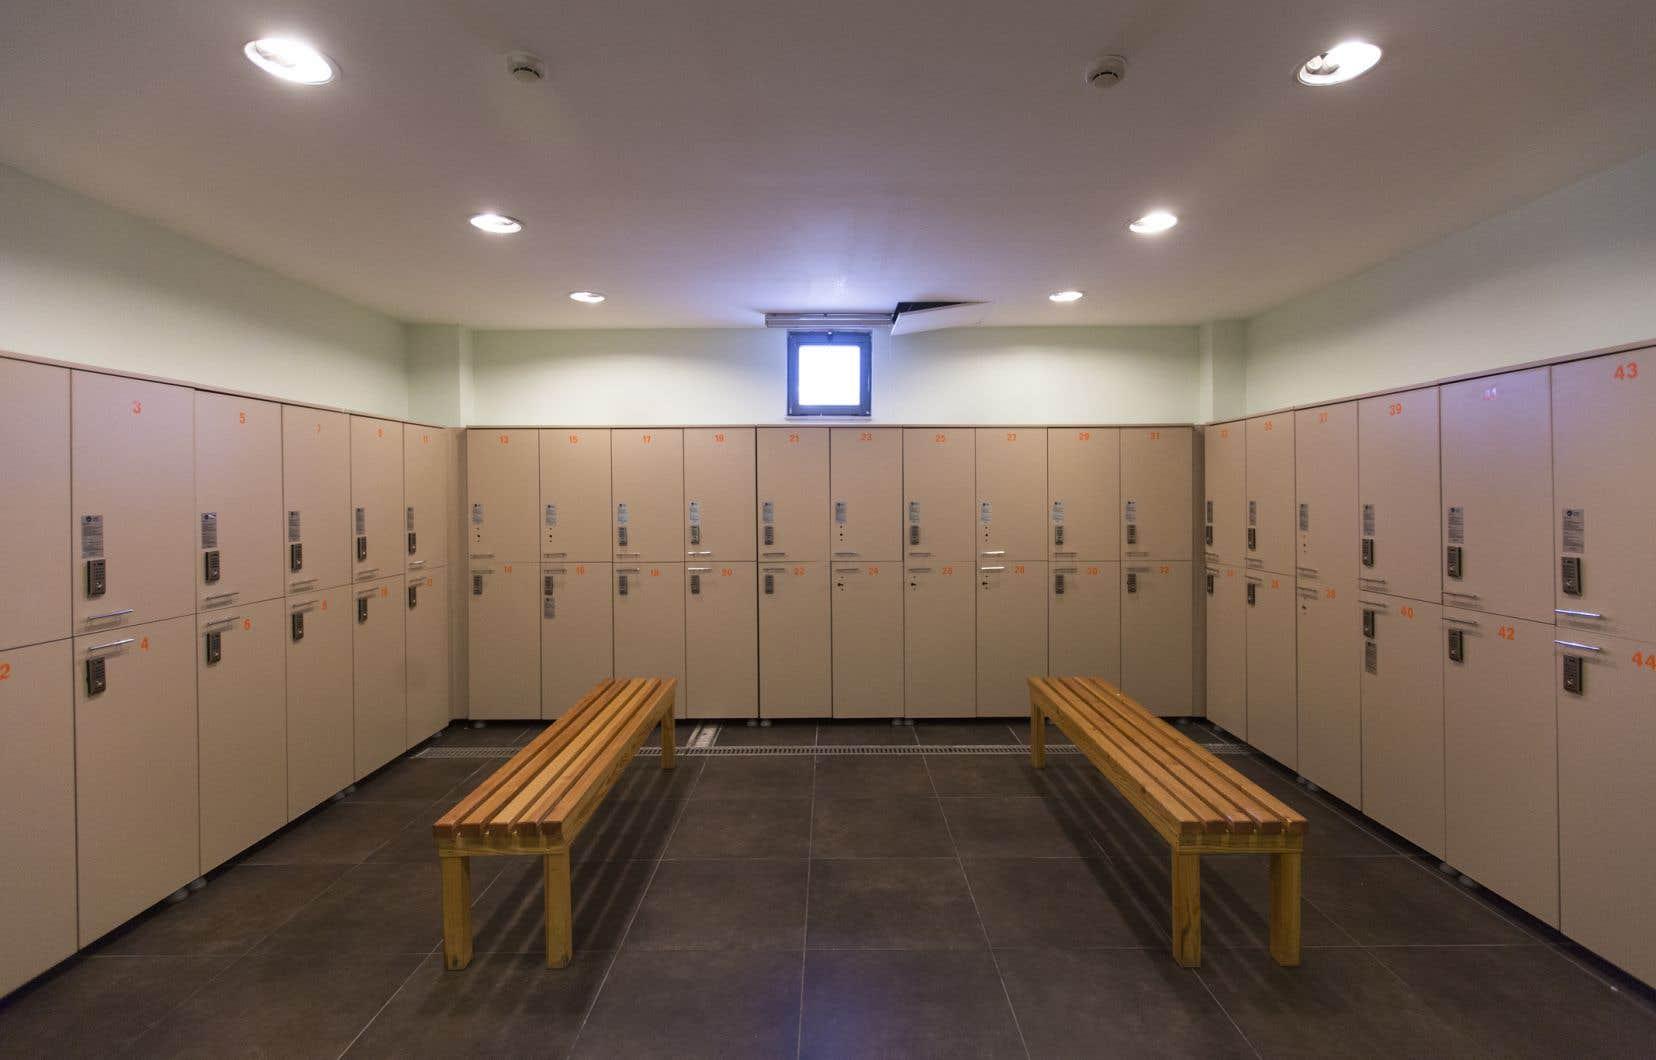 La Ville De Brossard Interdit La Nudité Dans Les. Tile Basement Floor. Basement Wall Panel System. Basement Apartments For Rent In Northern Va. Pella Basement Windows. Basement La. Basement Suites Edmonton. Interlocking Basement Flooring. The Basement Discs